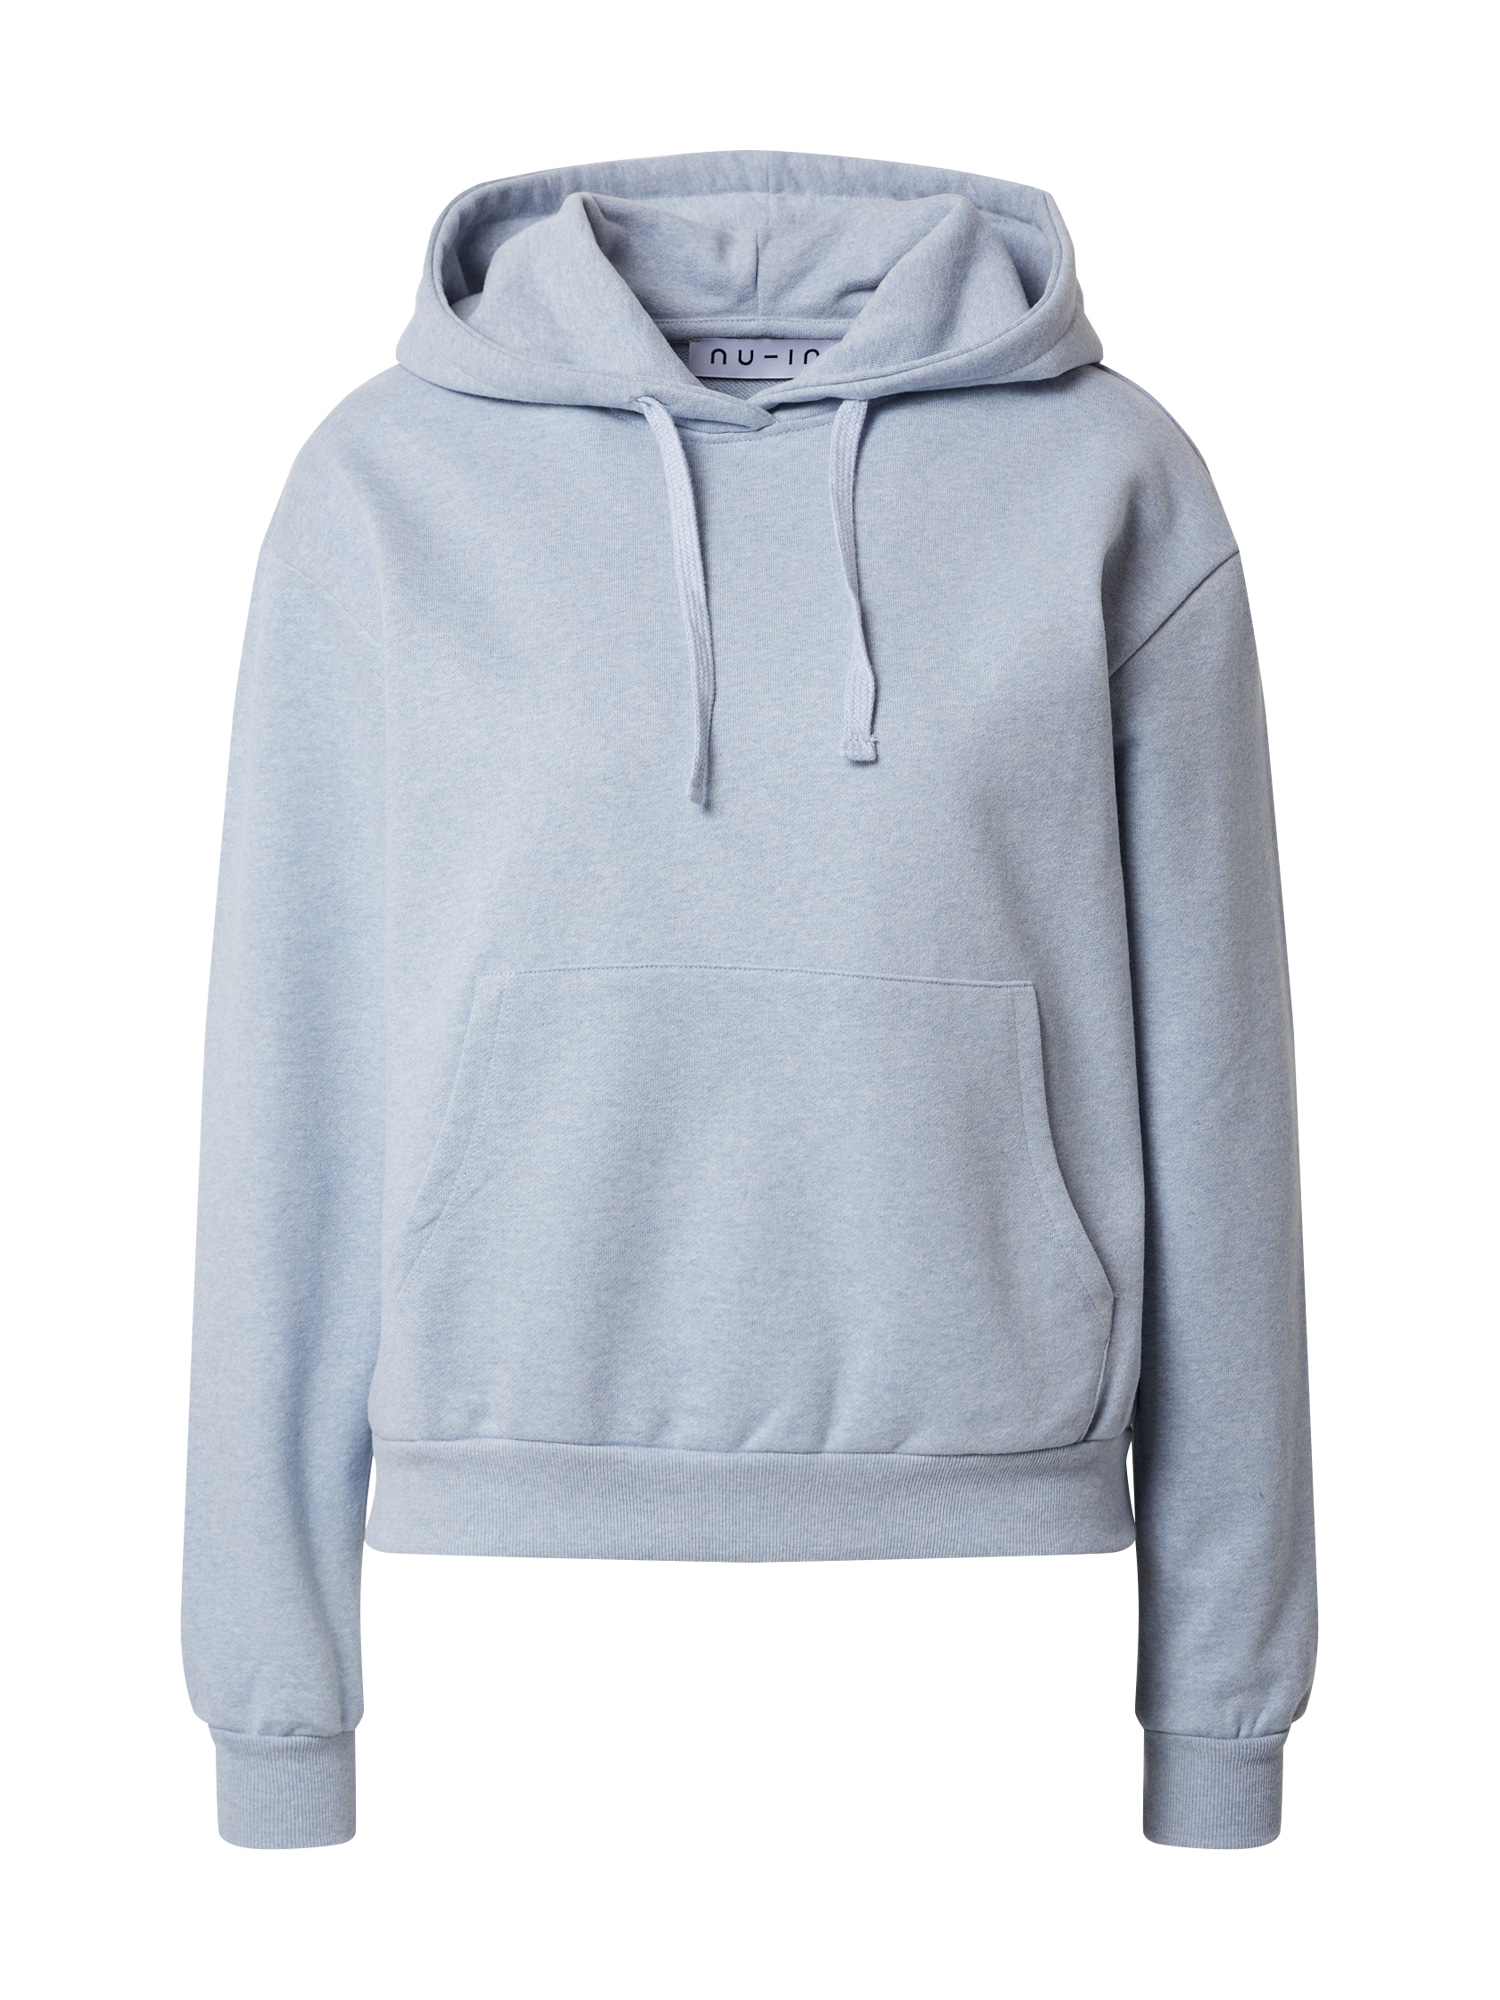 NU-IN Tréning póló  kék